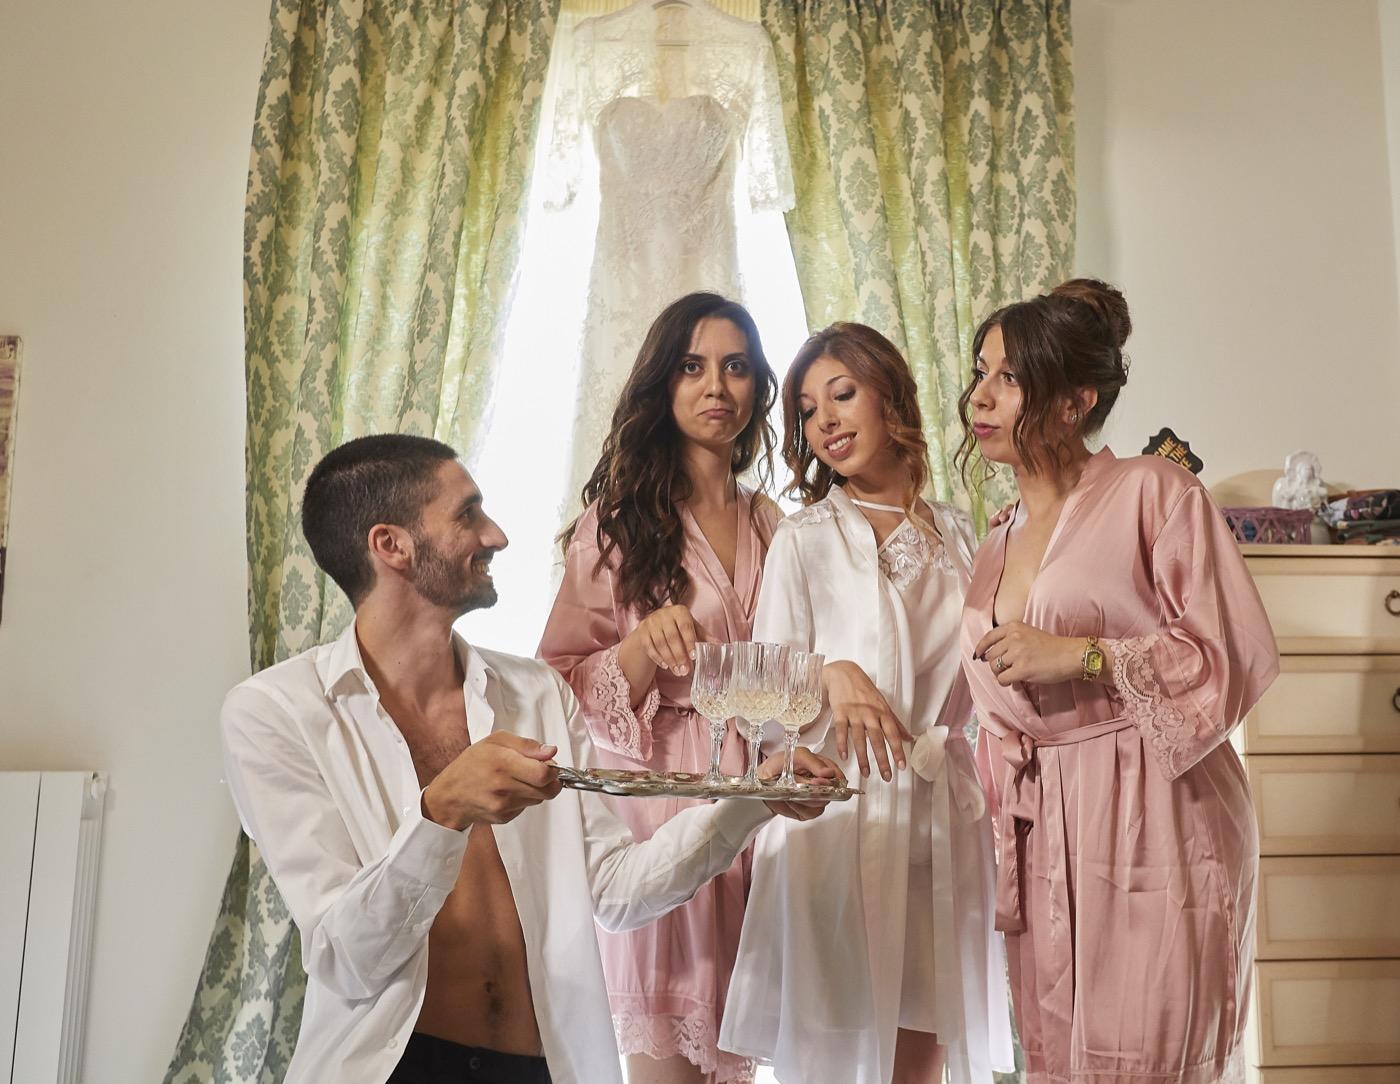 Claudio-Coppola-wedding-photographer-abbazia-7-frati-piegaro-29